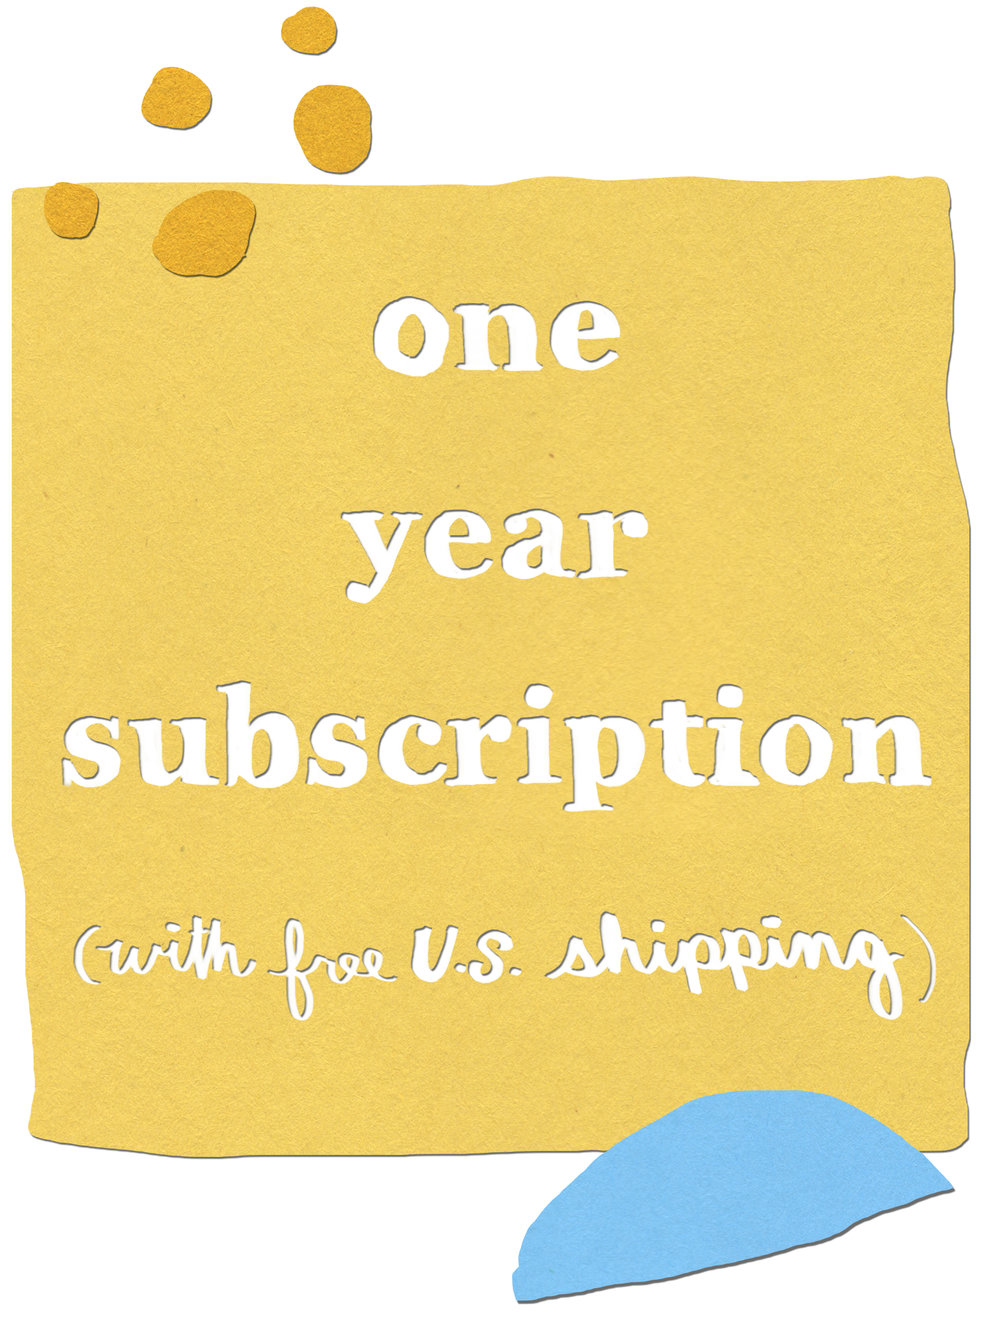 Subscription-US.jpg